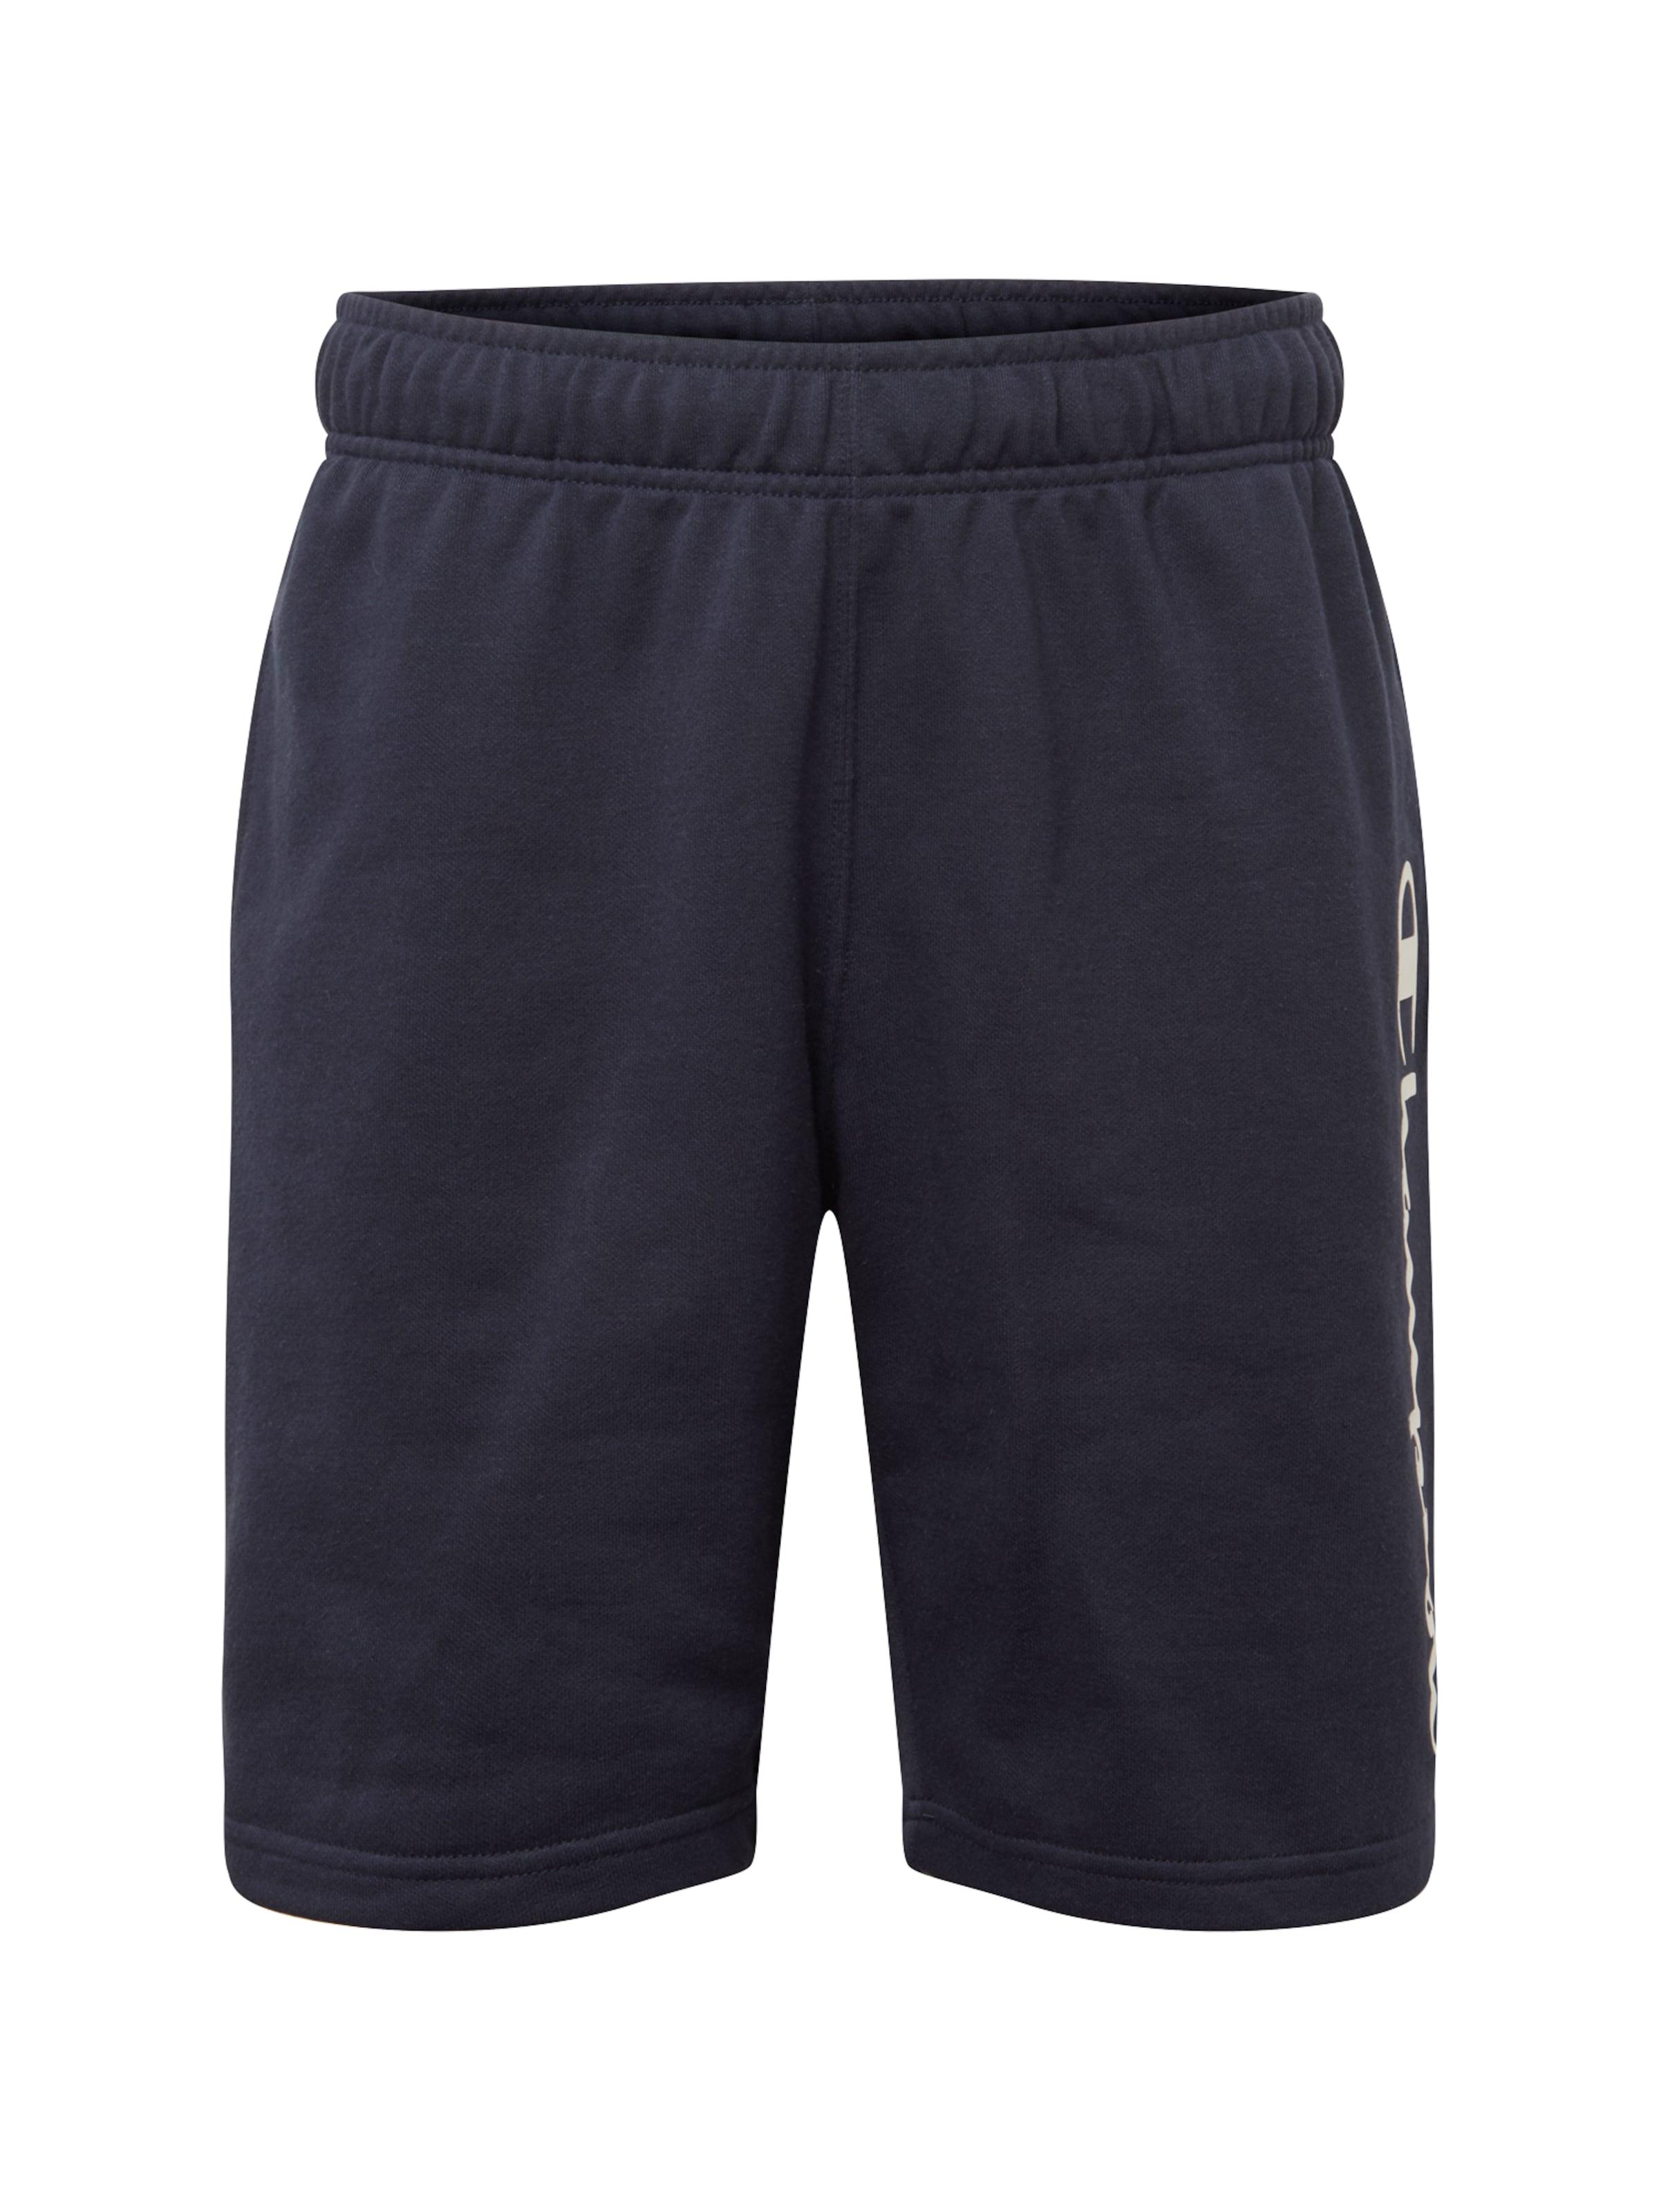 'bermuda' Pantalon Authentic Athletic Apparel En NoirBlanc Champion 5Ajq34RL